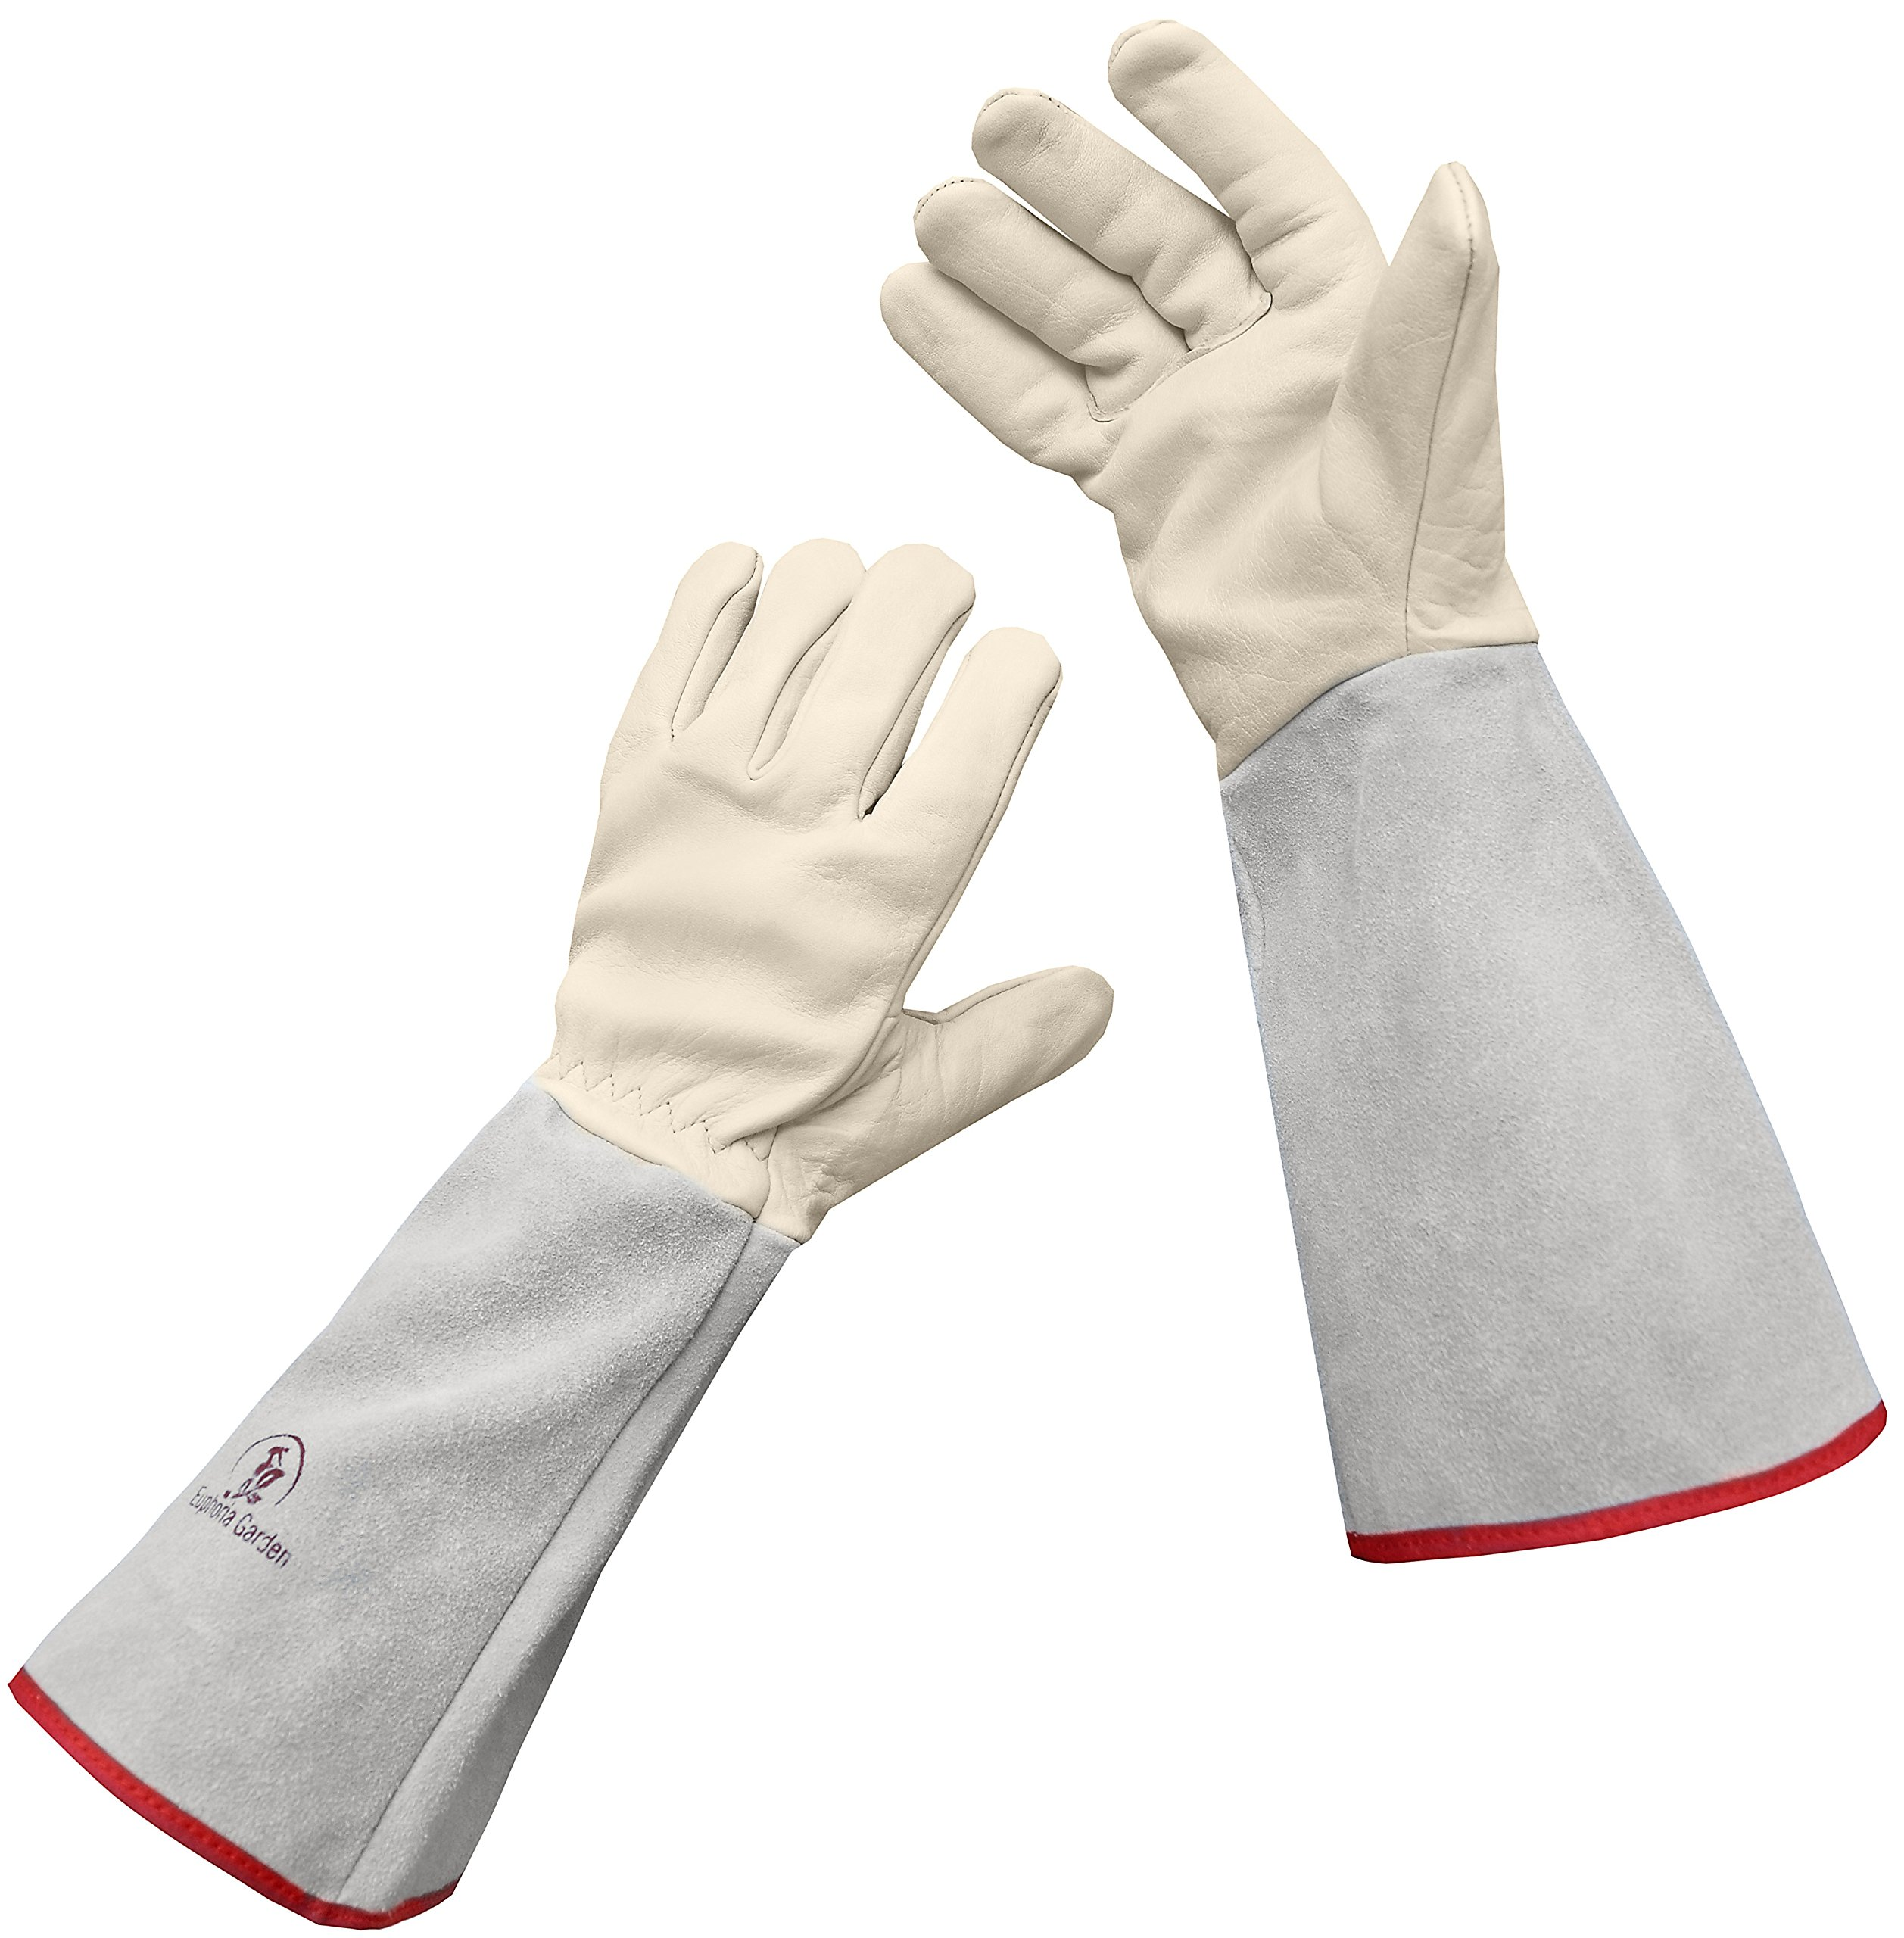 Euphoria Garden Thornproof Leather ROSE GARDENING Gauntlet Gloves – Medium by EUPHORIA GARDEN